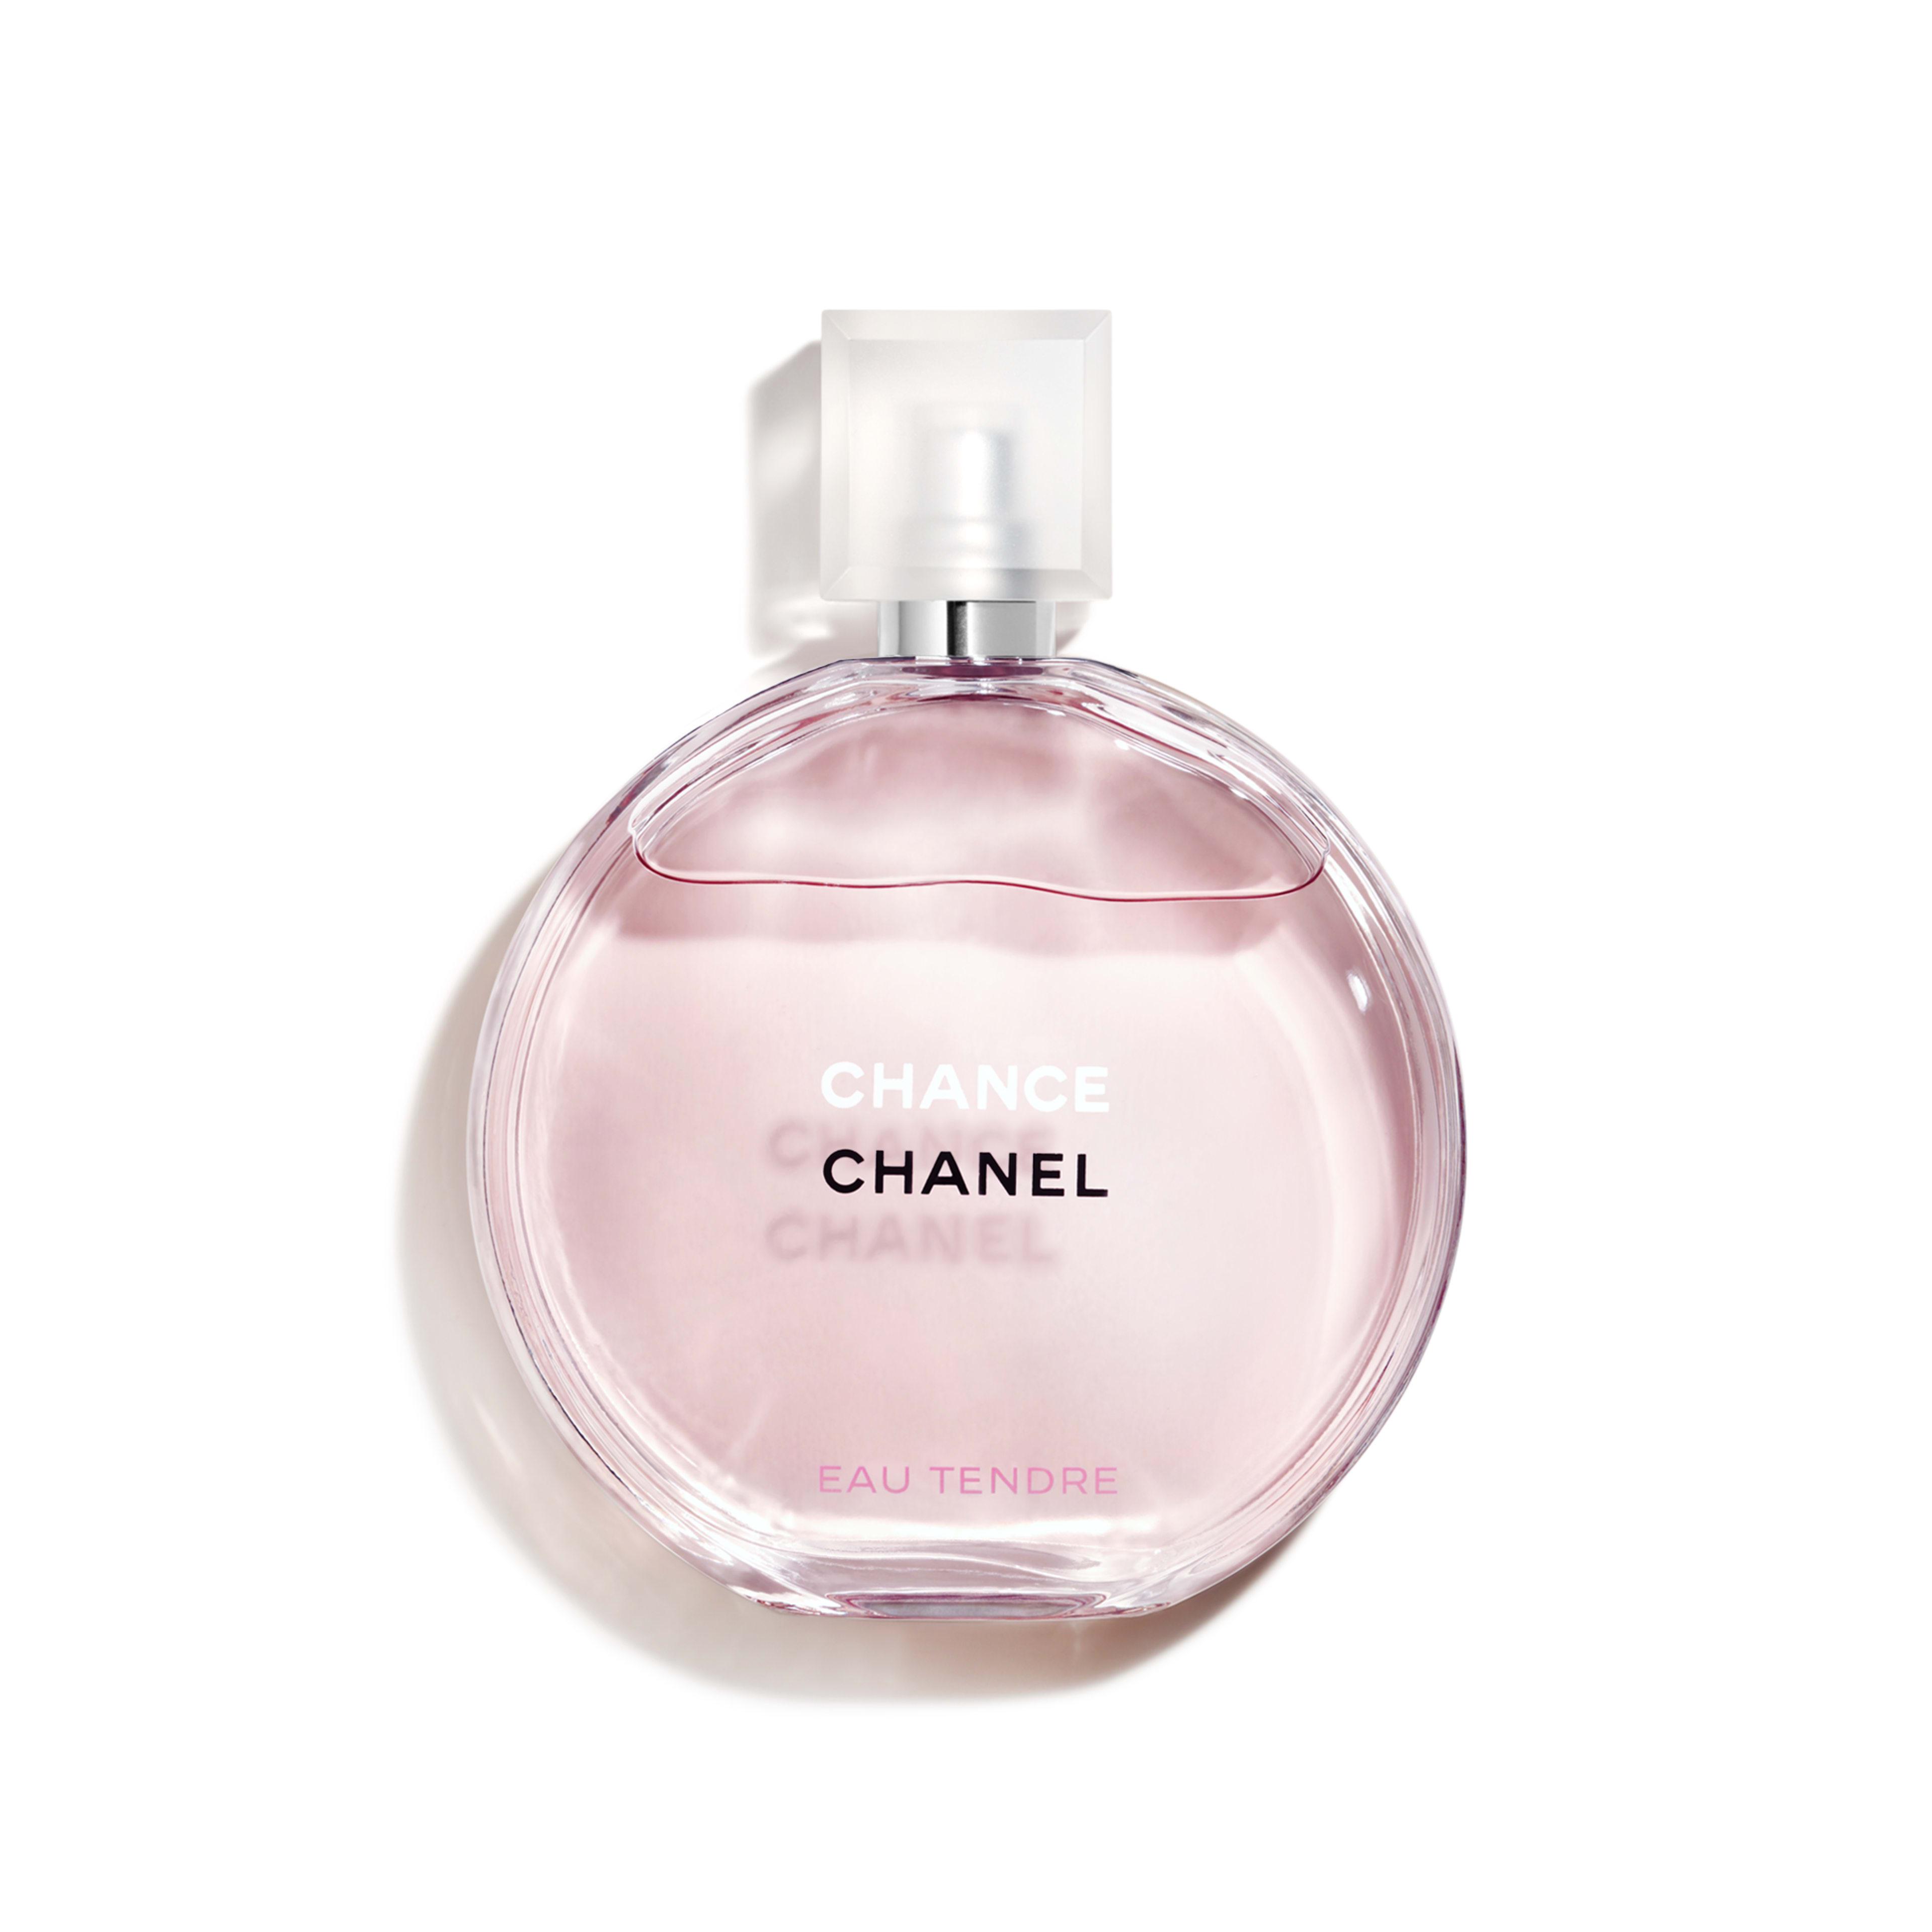 Chanel 香奈兒 CHANCE 粉紅甜蜜淡香水 35ml 機場航空版 現貨 交換禮物【SP嚴選家】